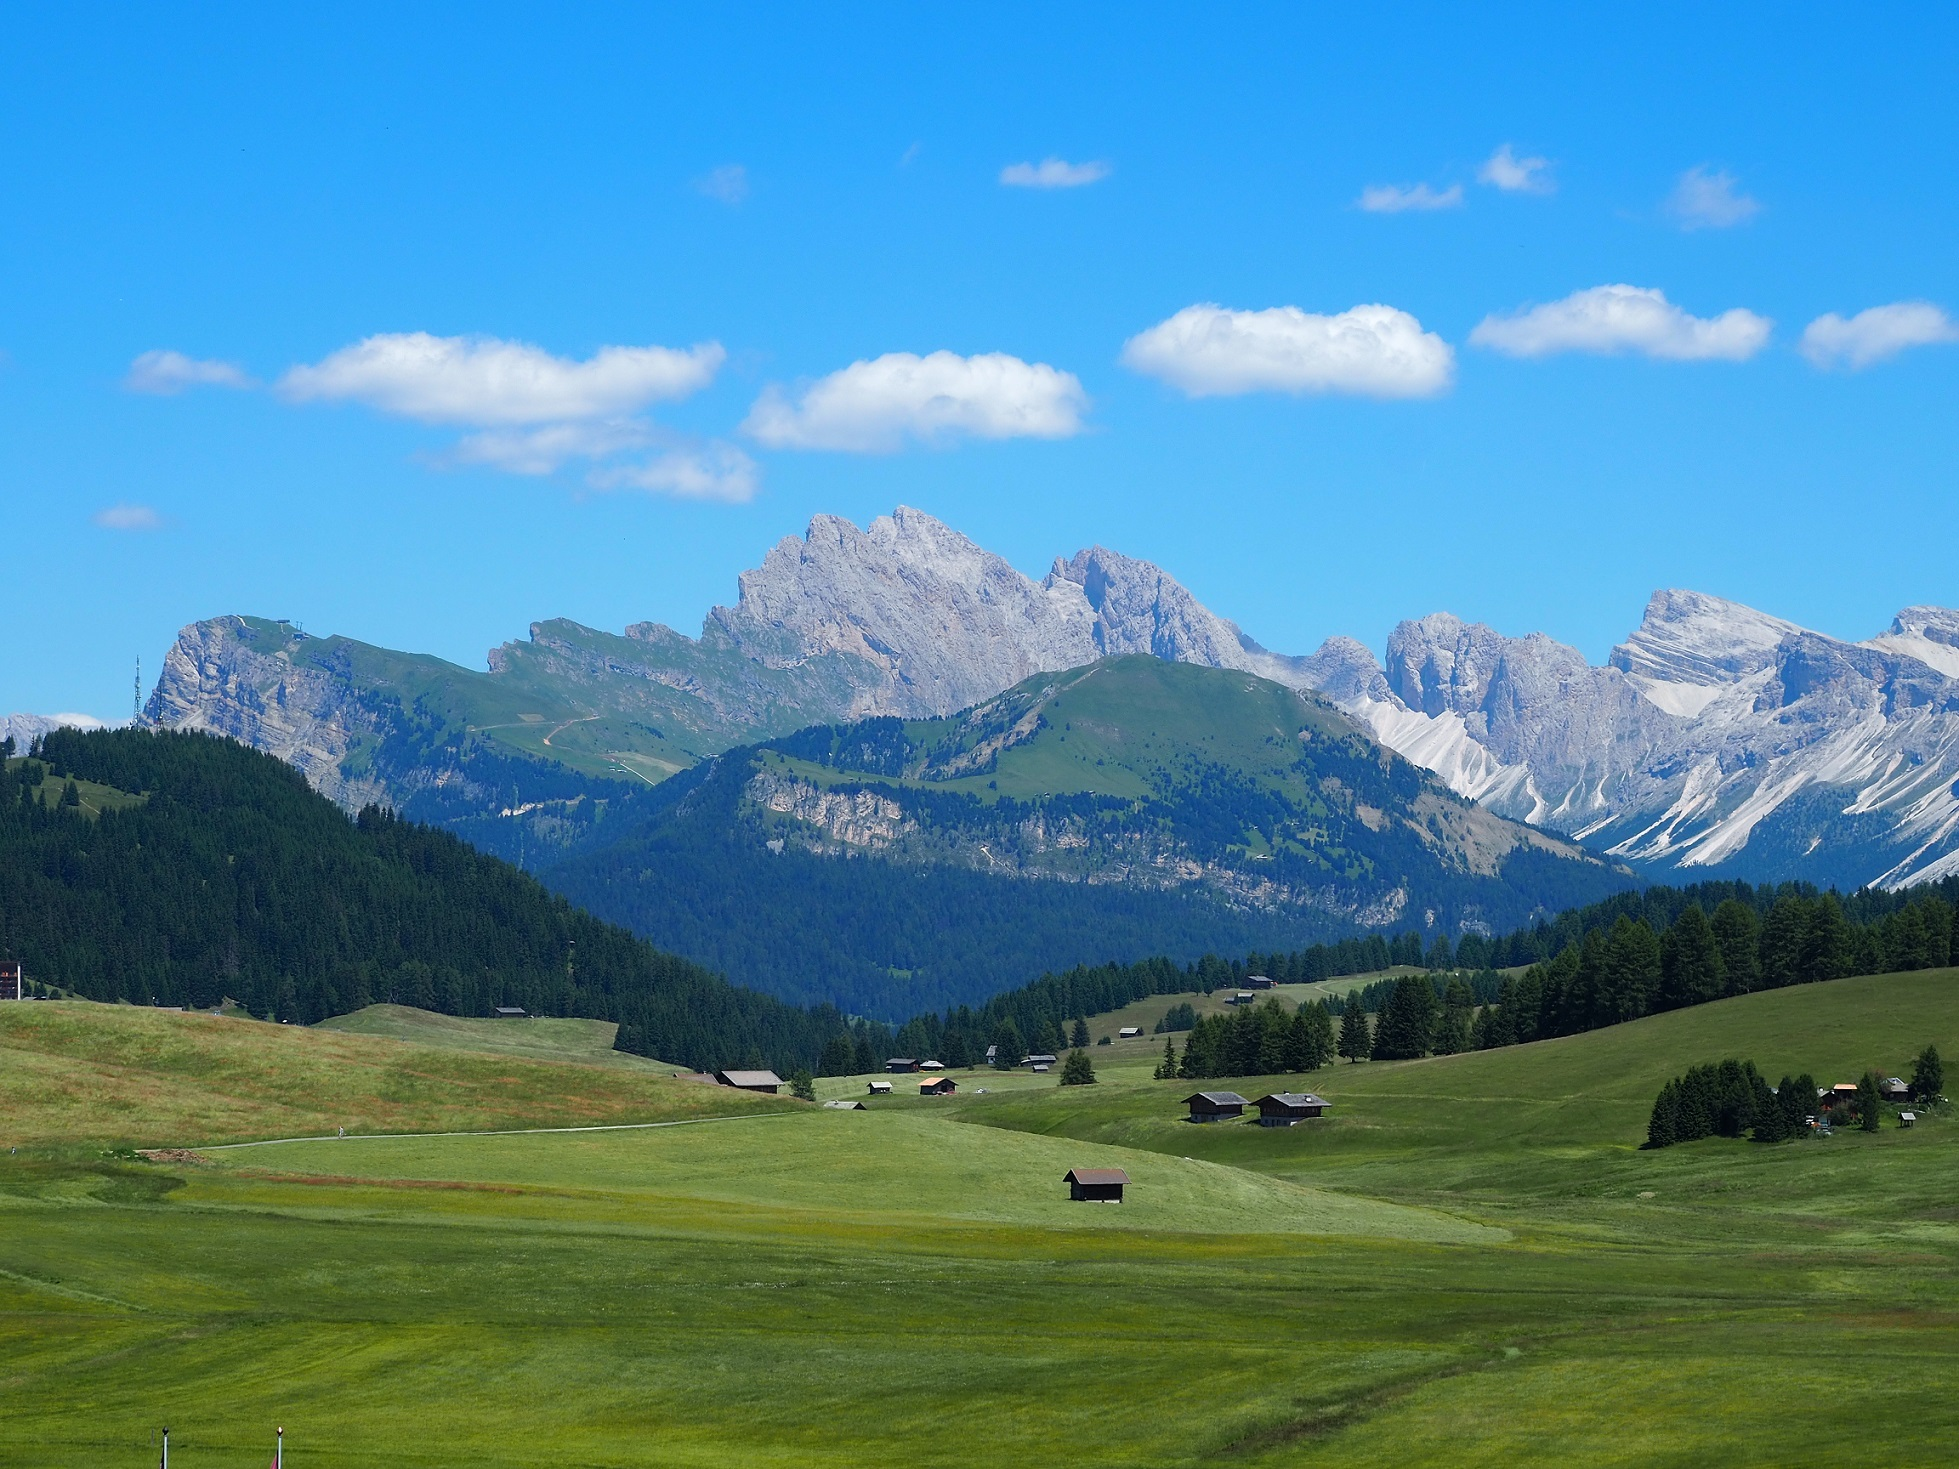 Seceda vue depuis Alpe di Siusi dans les Dolomites en Italie